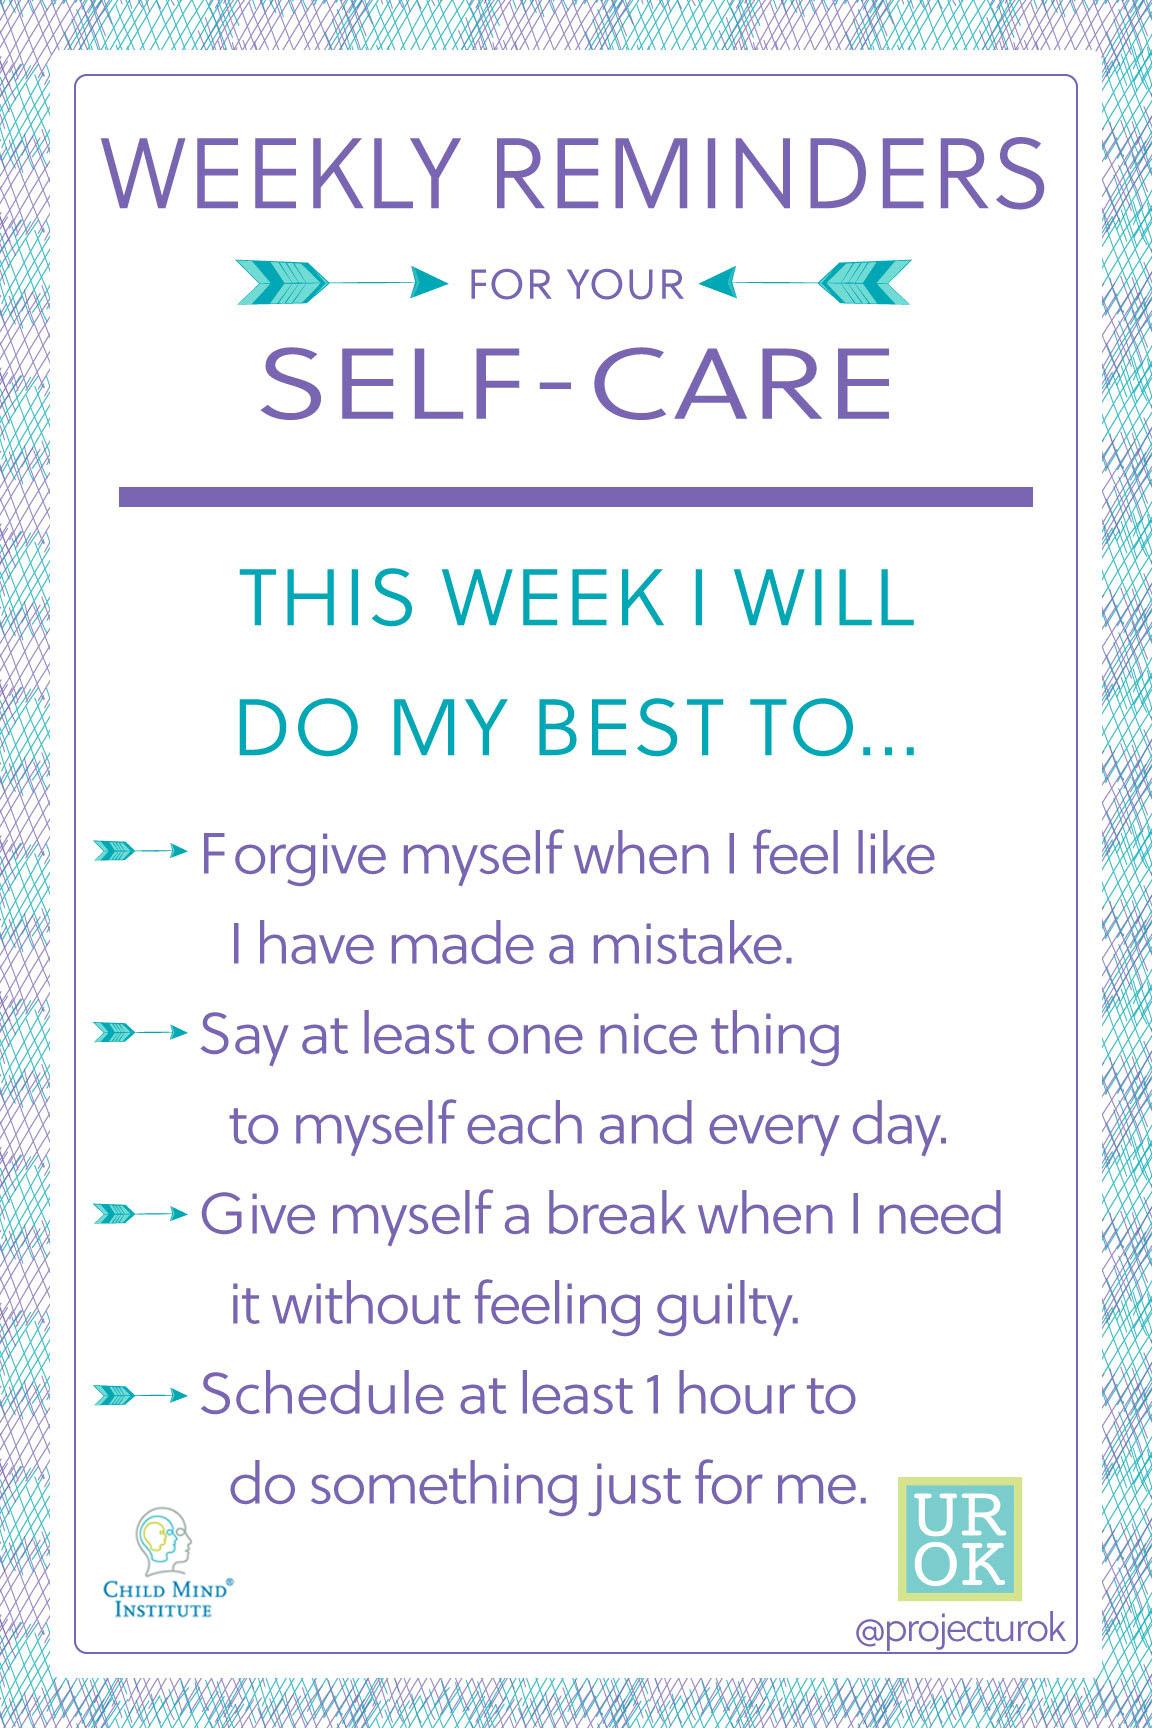 Weekly Reminders for Self-Care.jpg